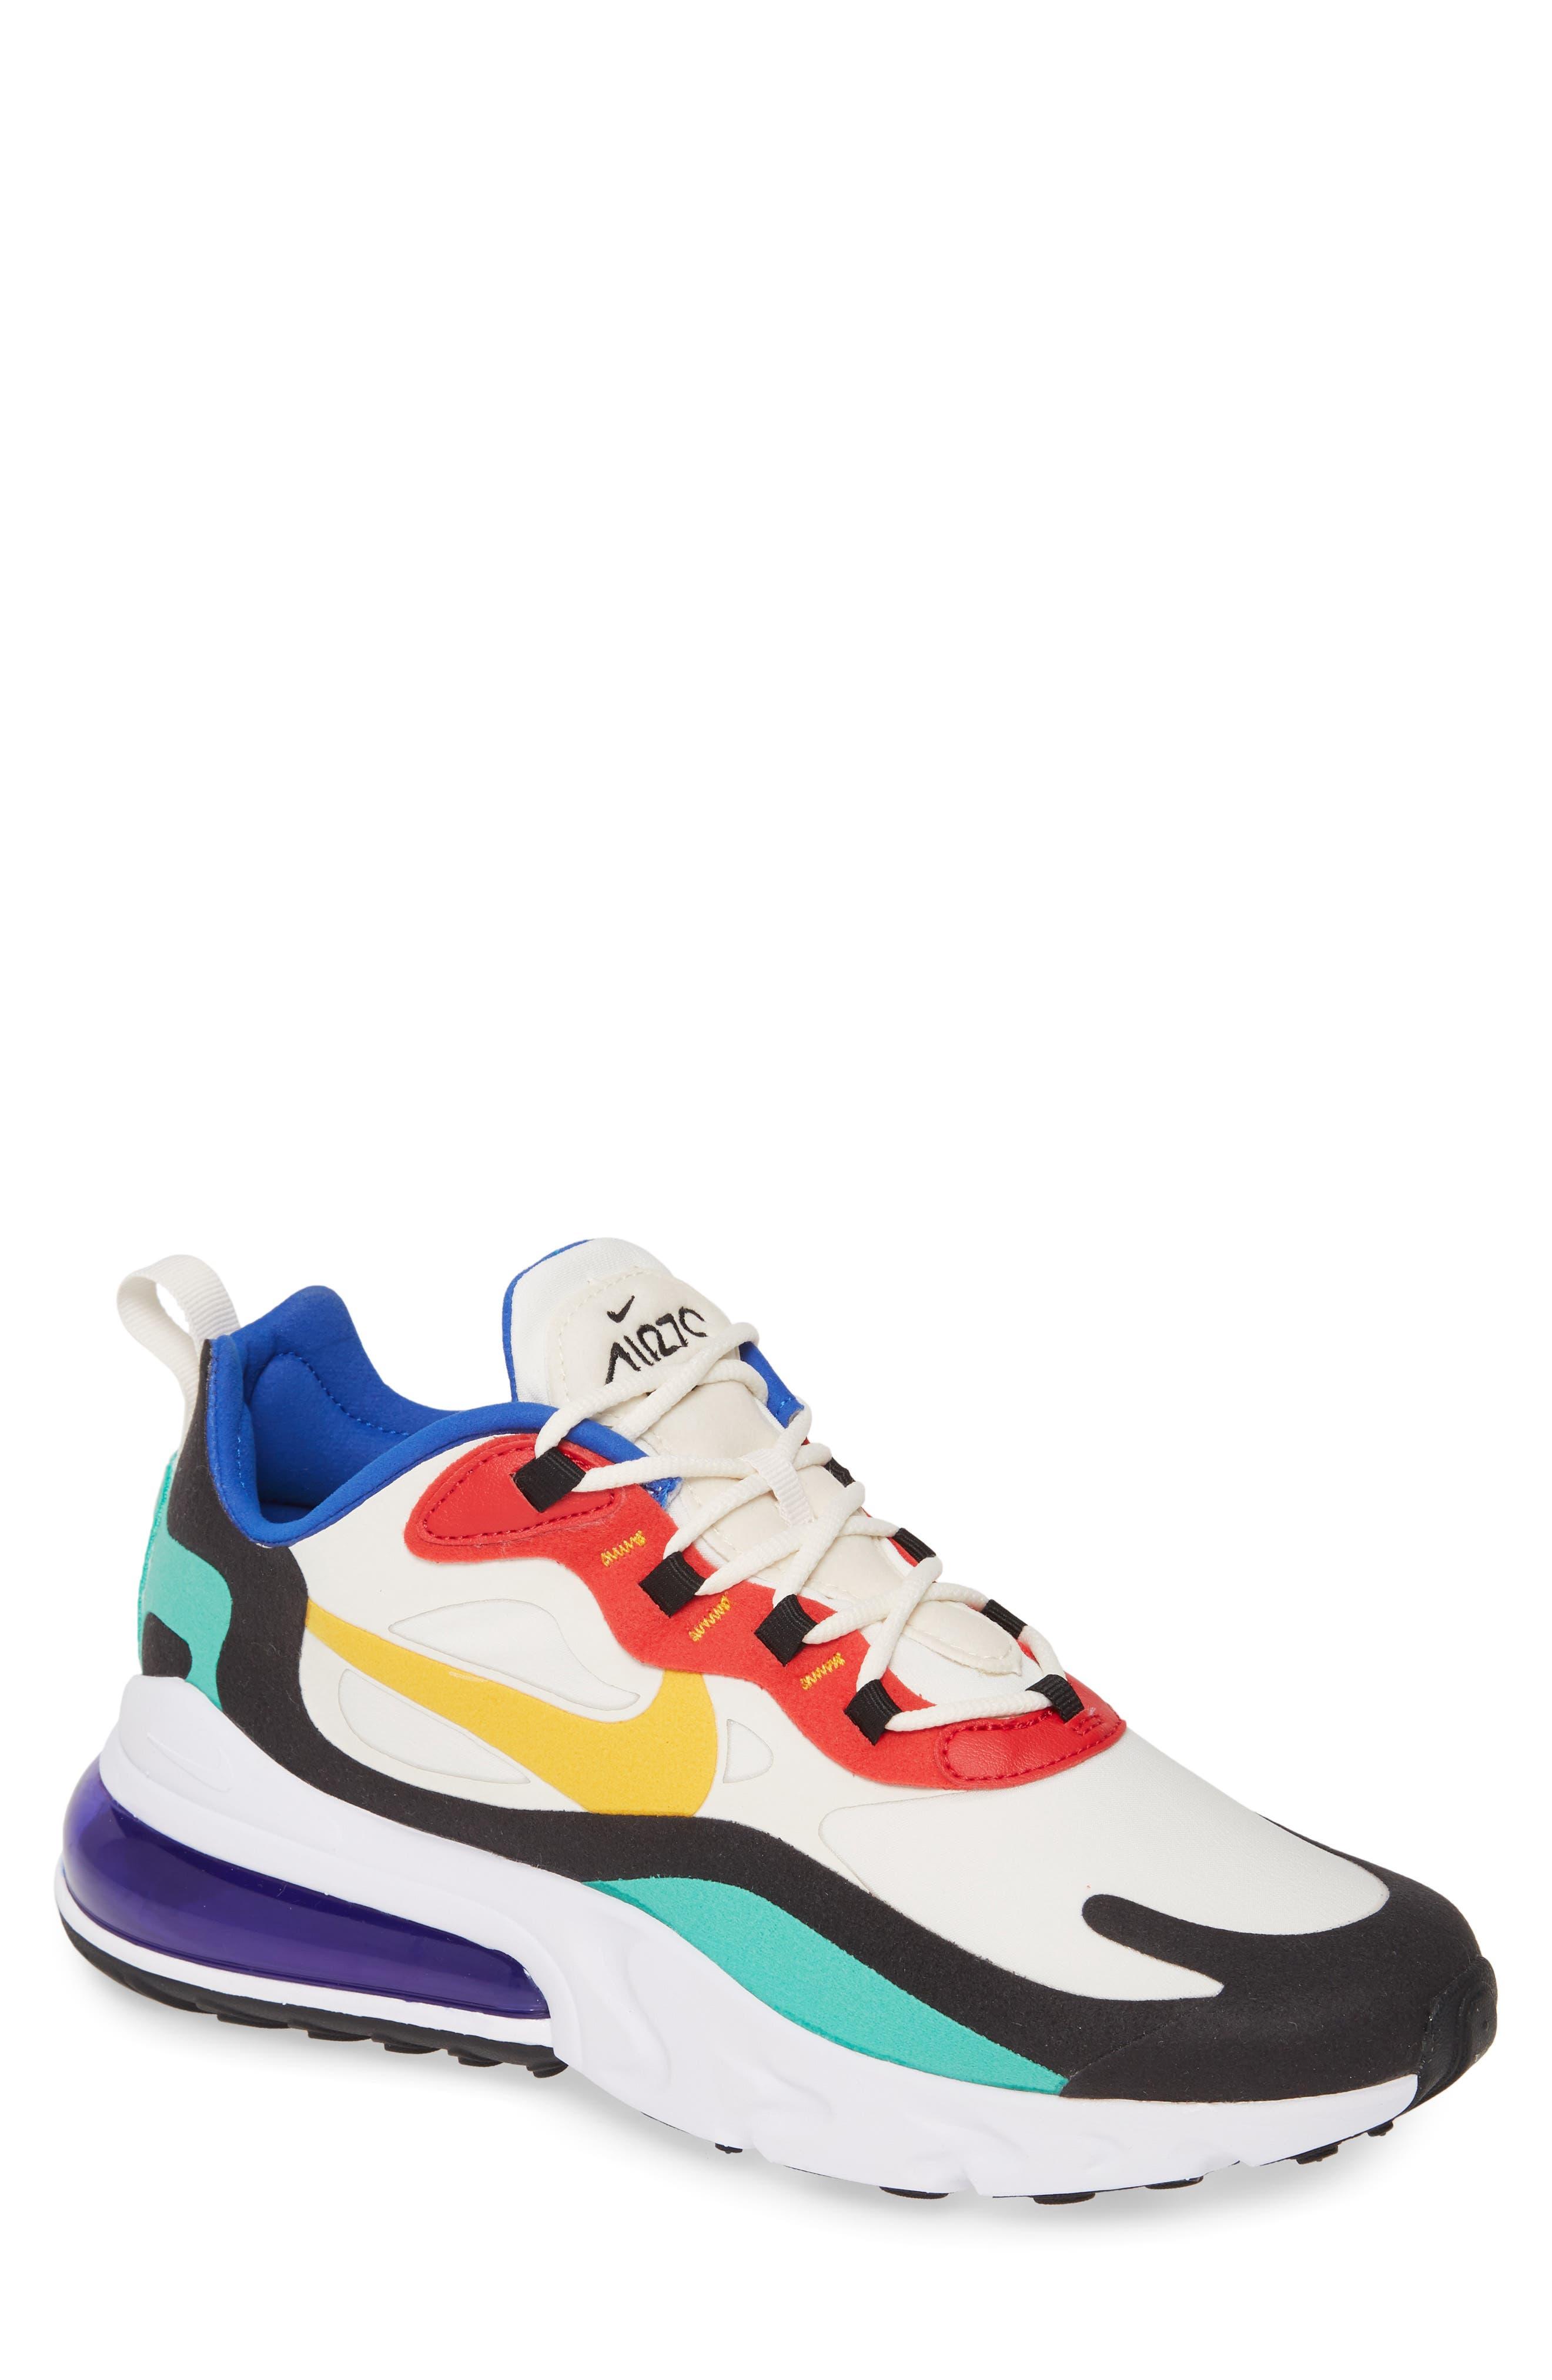 Nike Sneakers UPC & Barcode   upcitemdb com